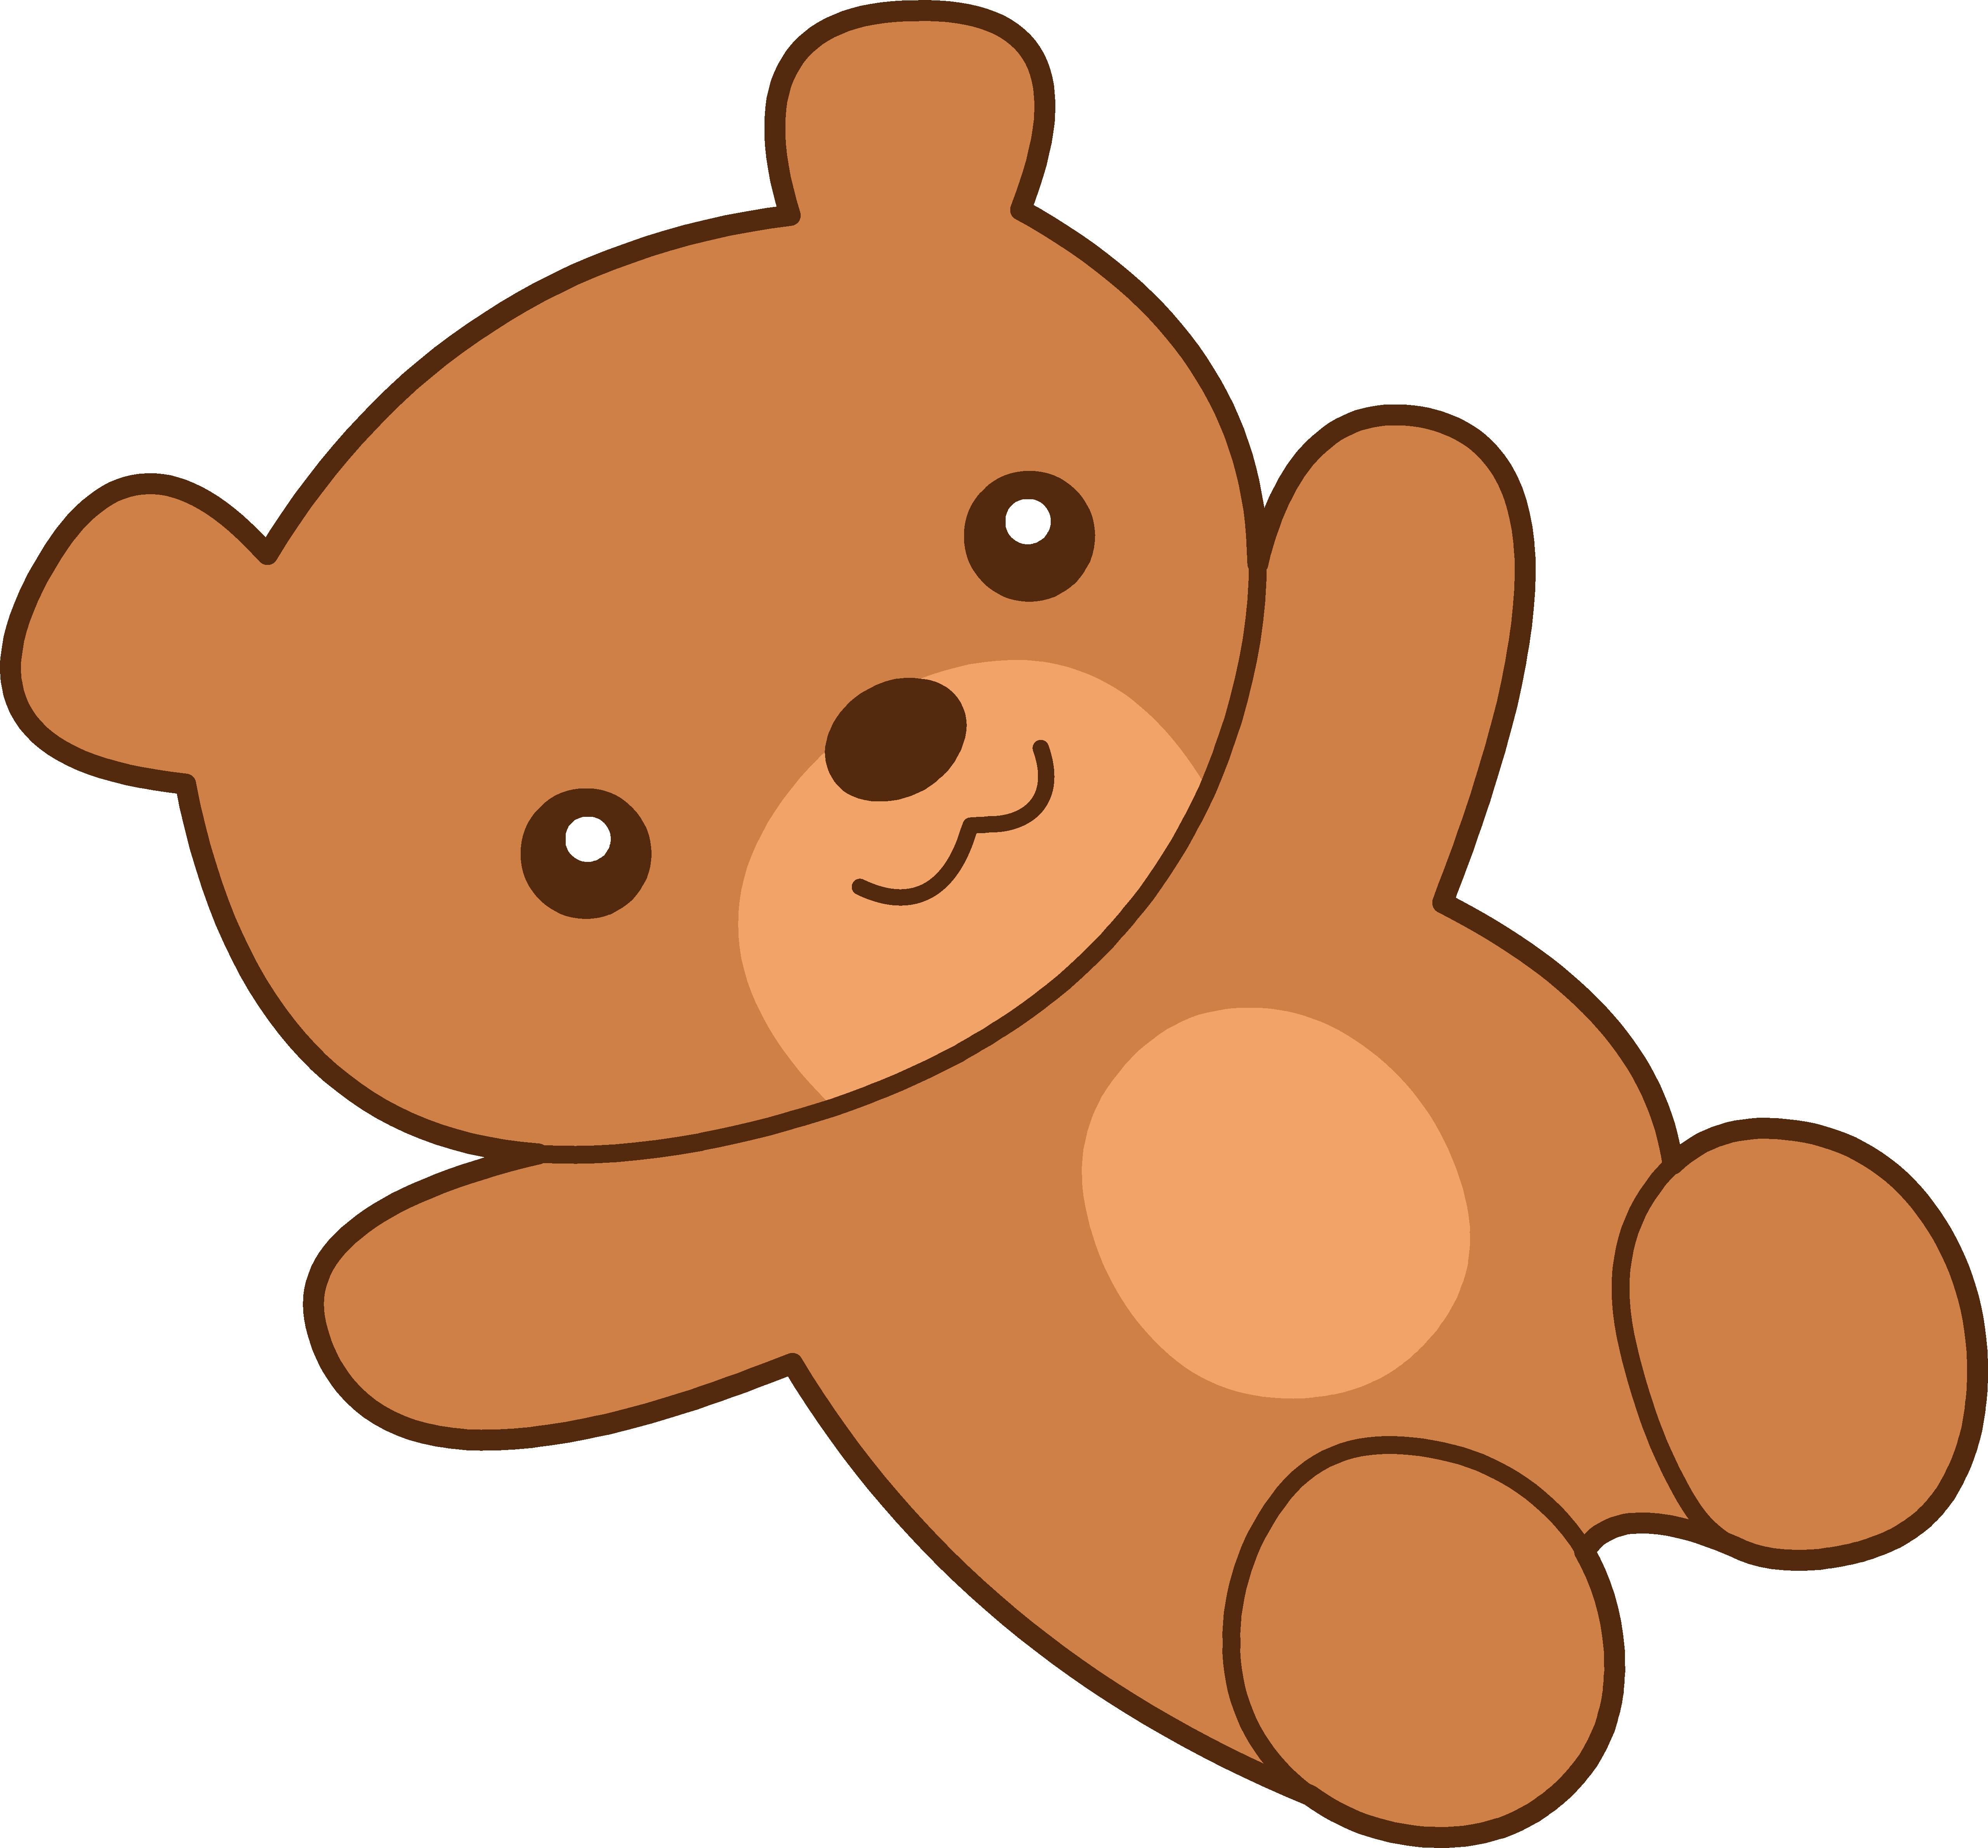 Bear Clip Art - Teddy Bear Clip Art Free